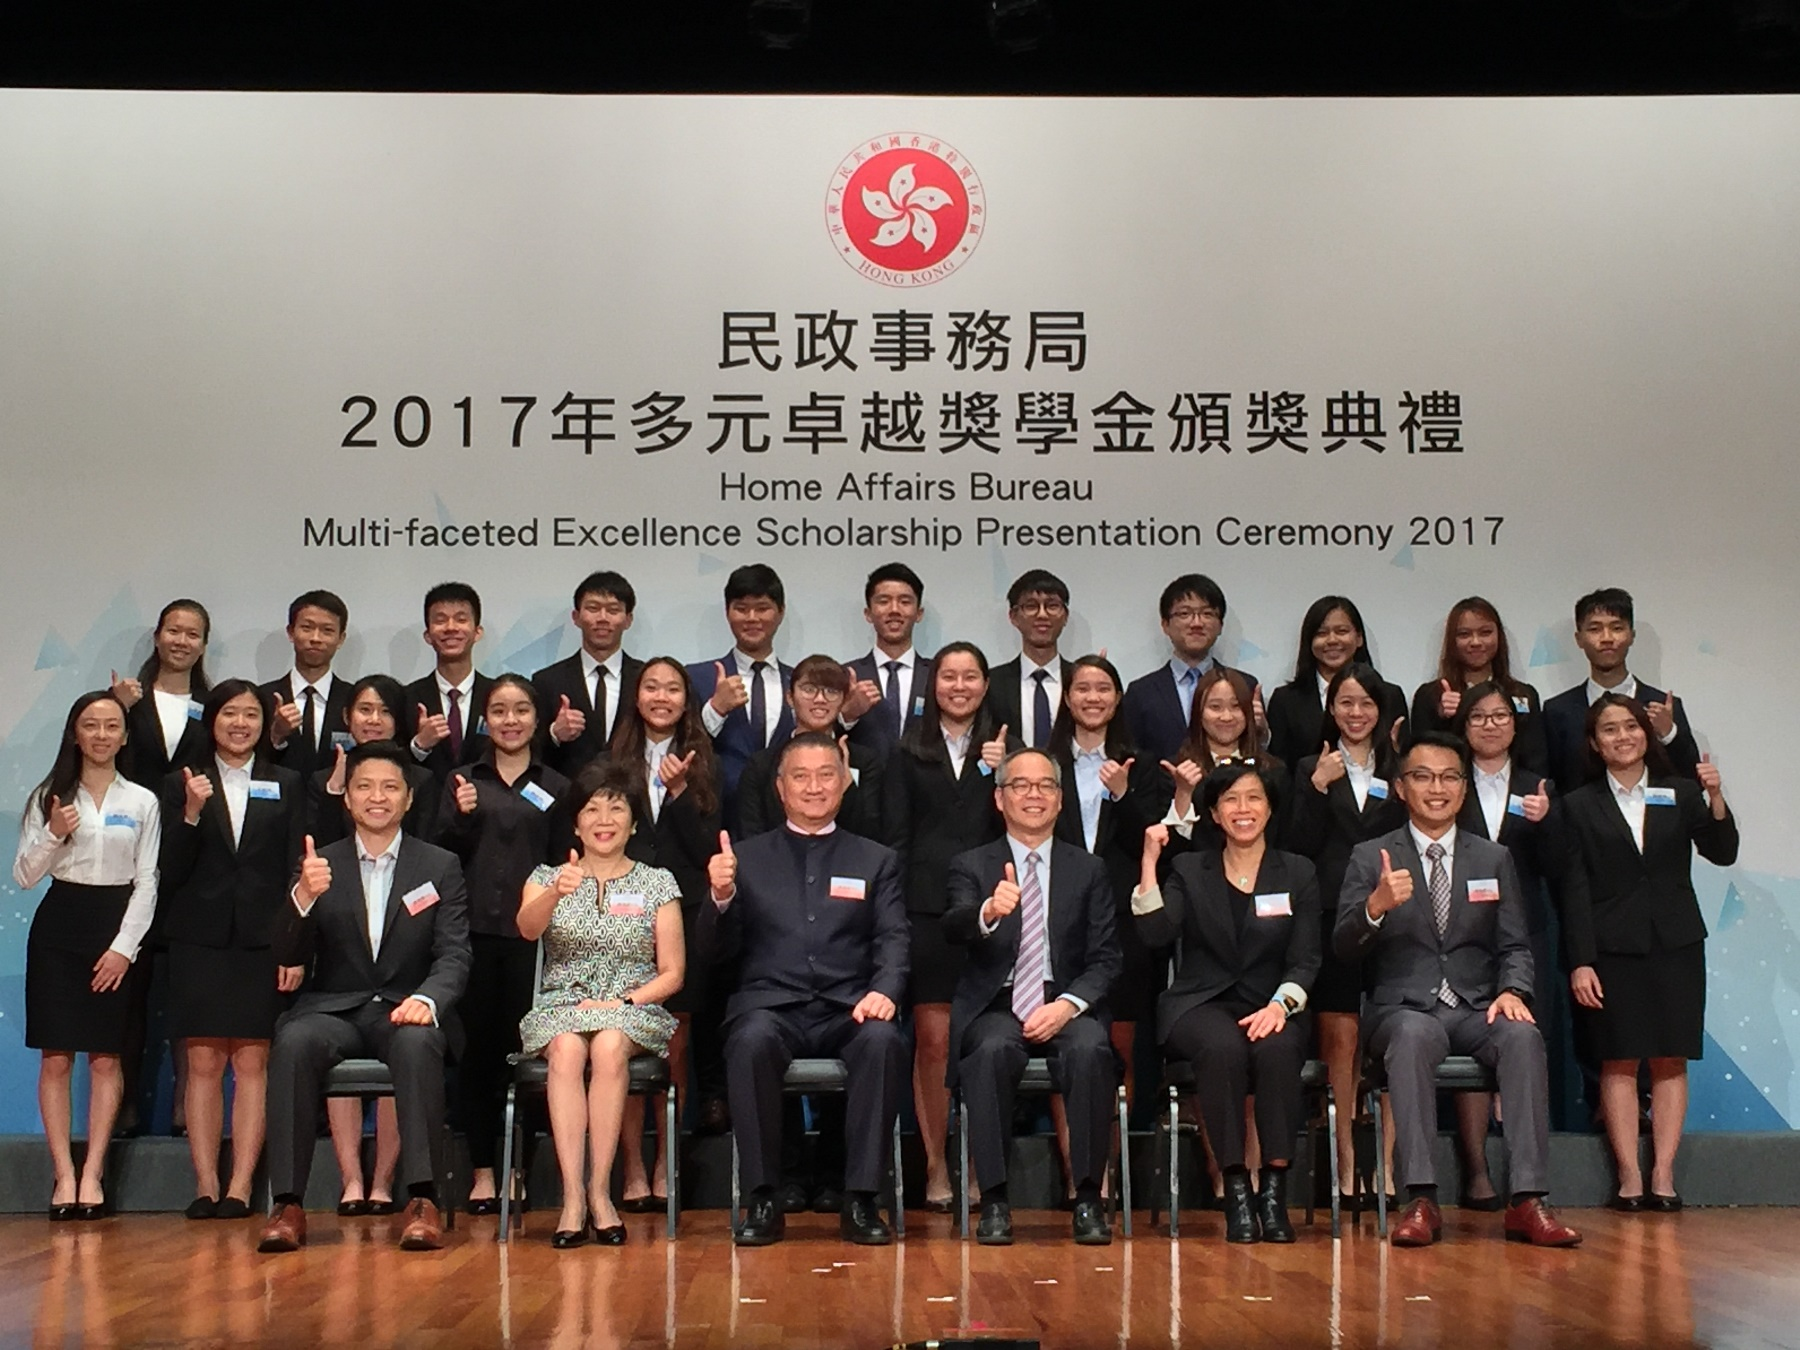 http://npc.edu.hk/sites/default/files/img_1686.jpg